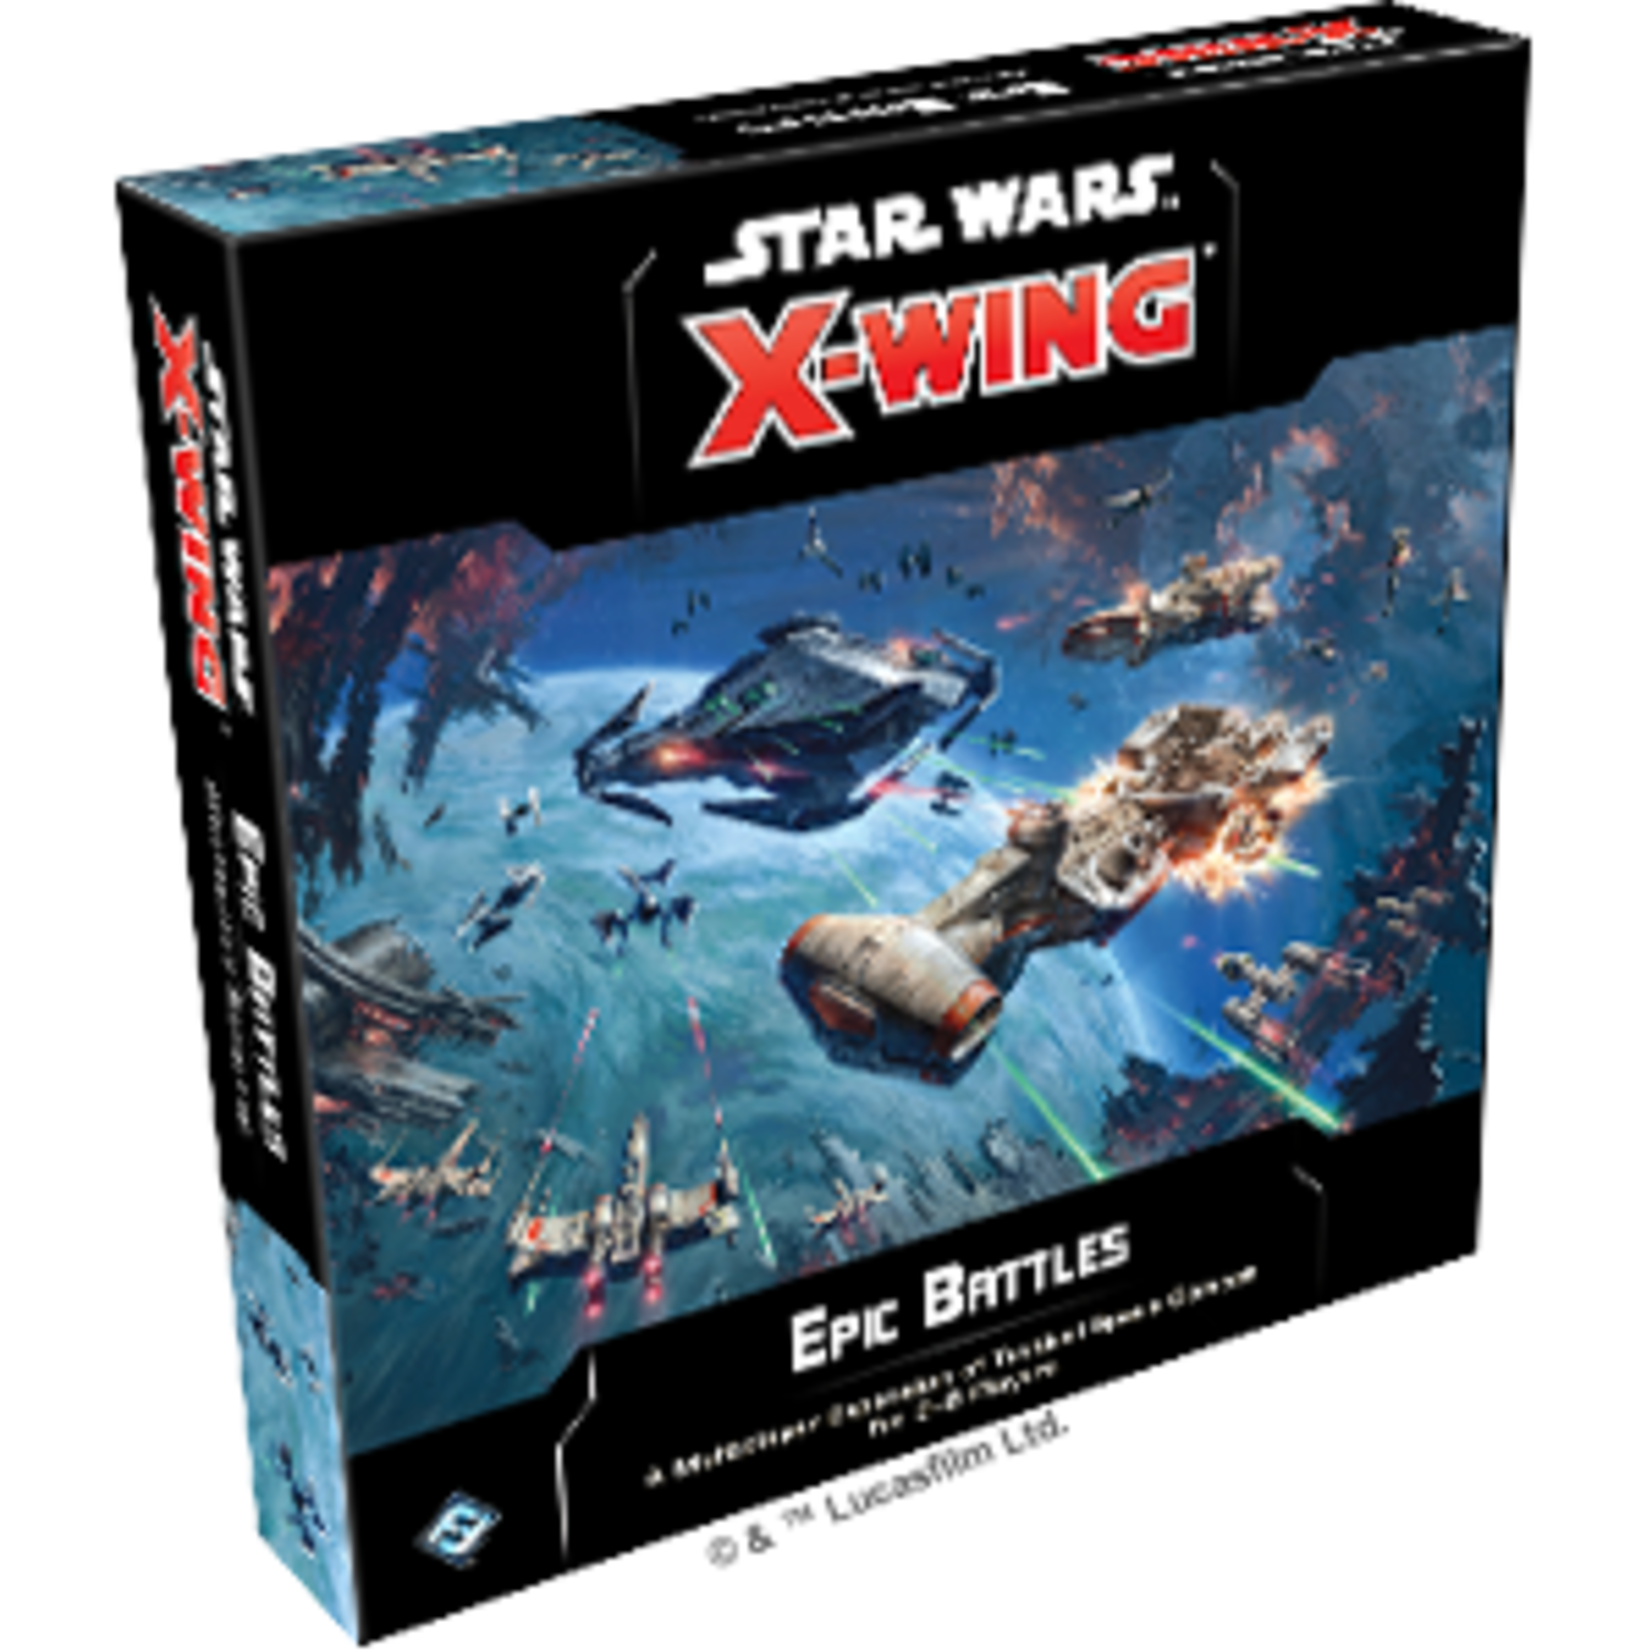 Fantasy Flight Games Star Wars X-Wing Epic Battles Multiplayer Expansion